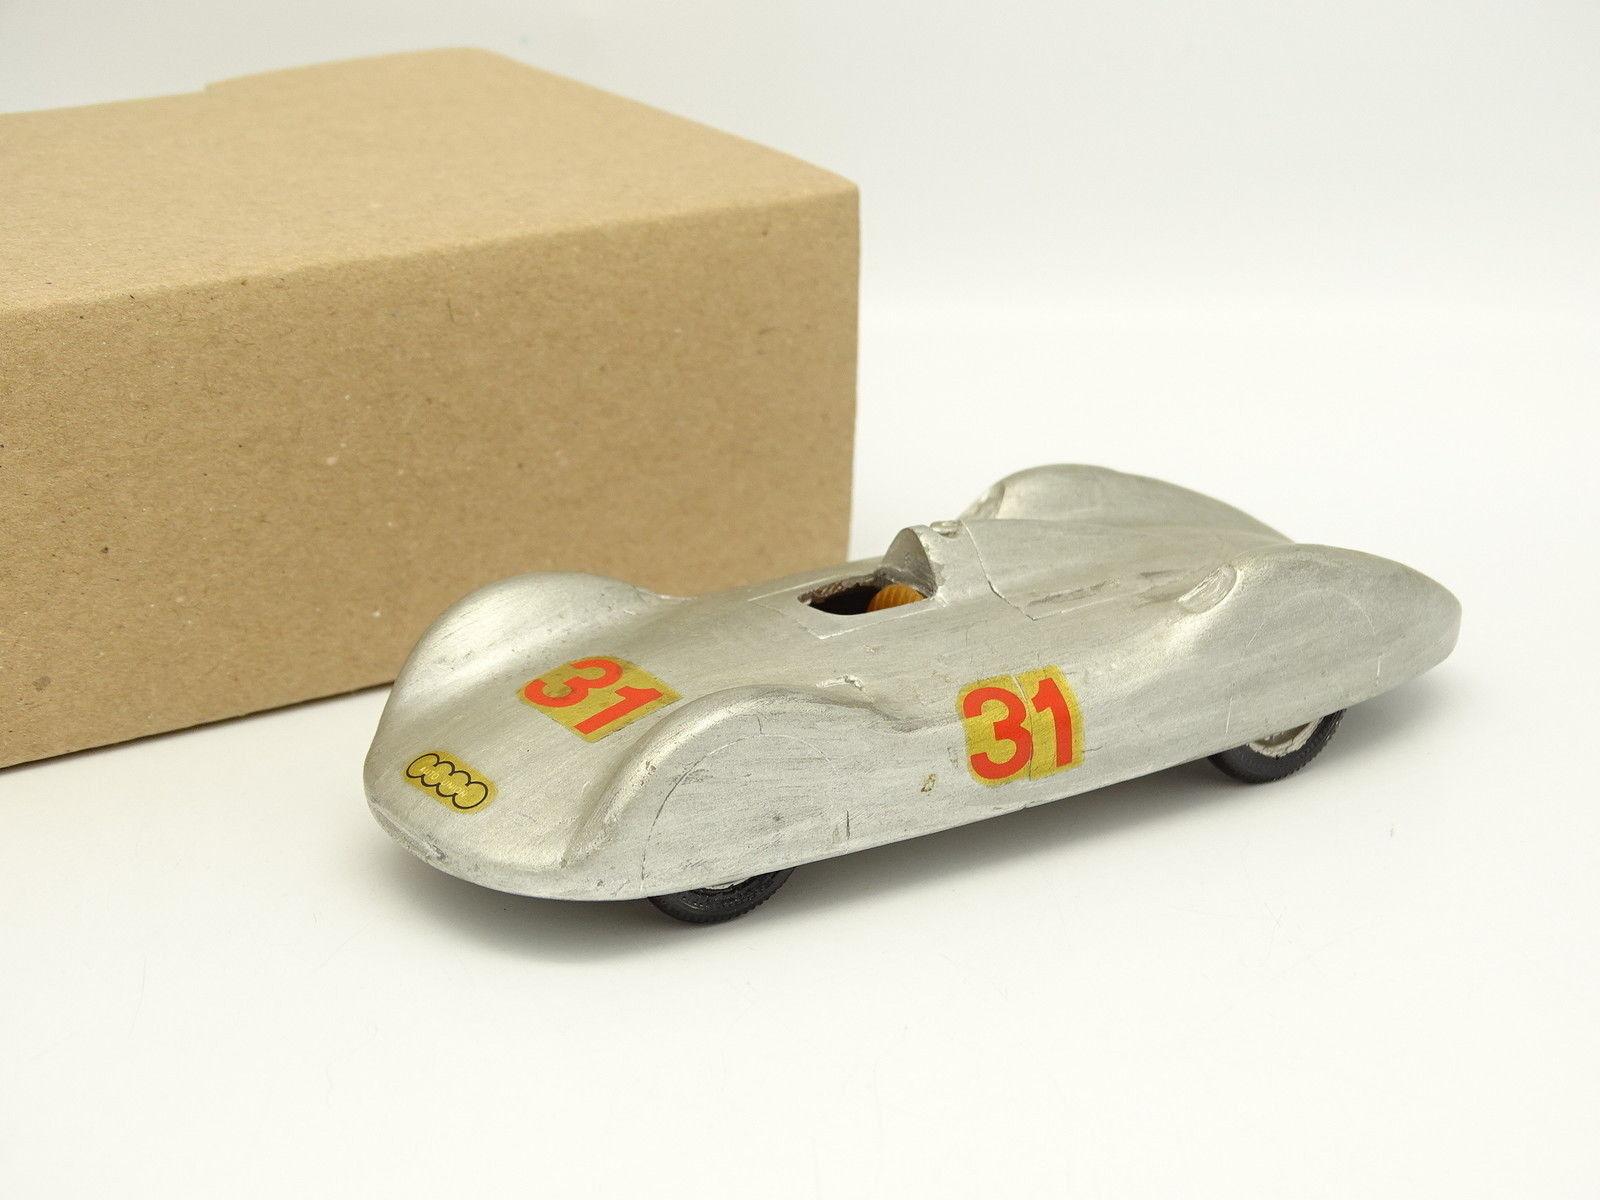 Danhausen Kit Metal Assembled 1 43 - Auto Union Type Rekord C wagen 1938